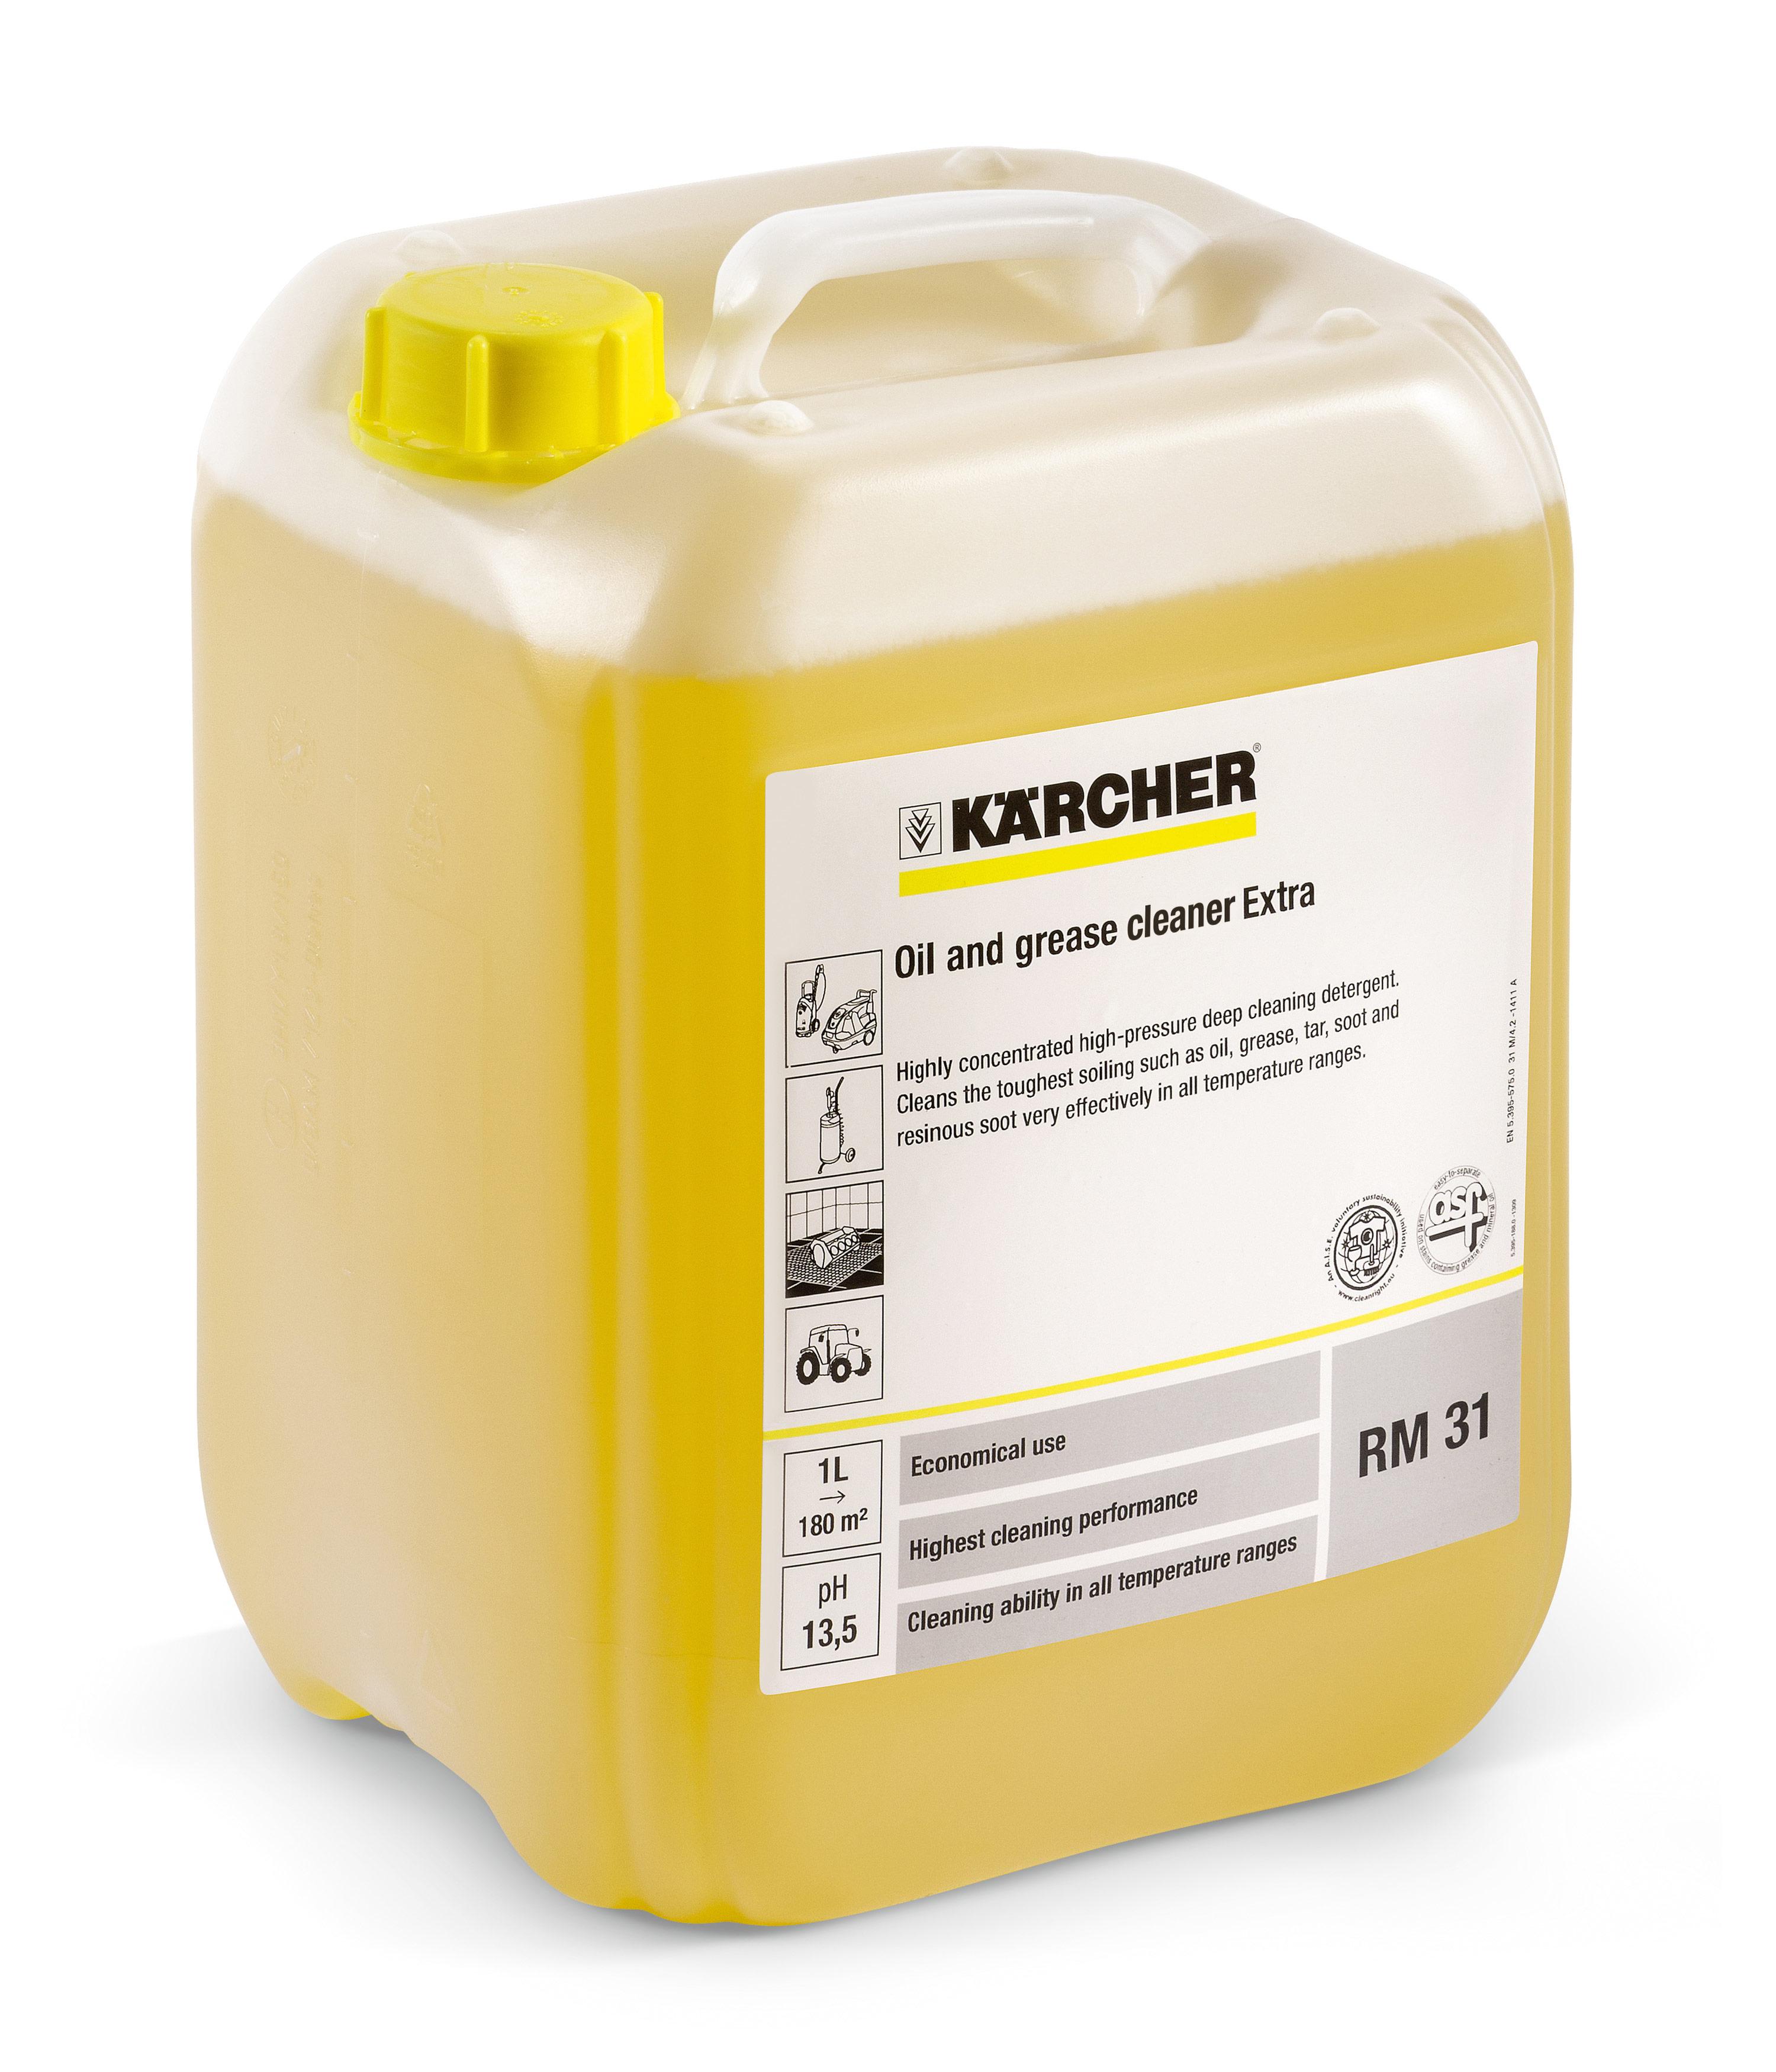 Rengjøringsmiddel med alkalisk konsentrat Karcher RM 31 10 l